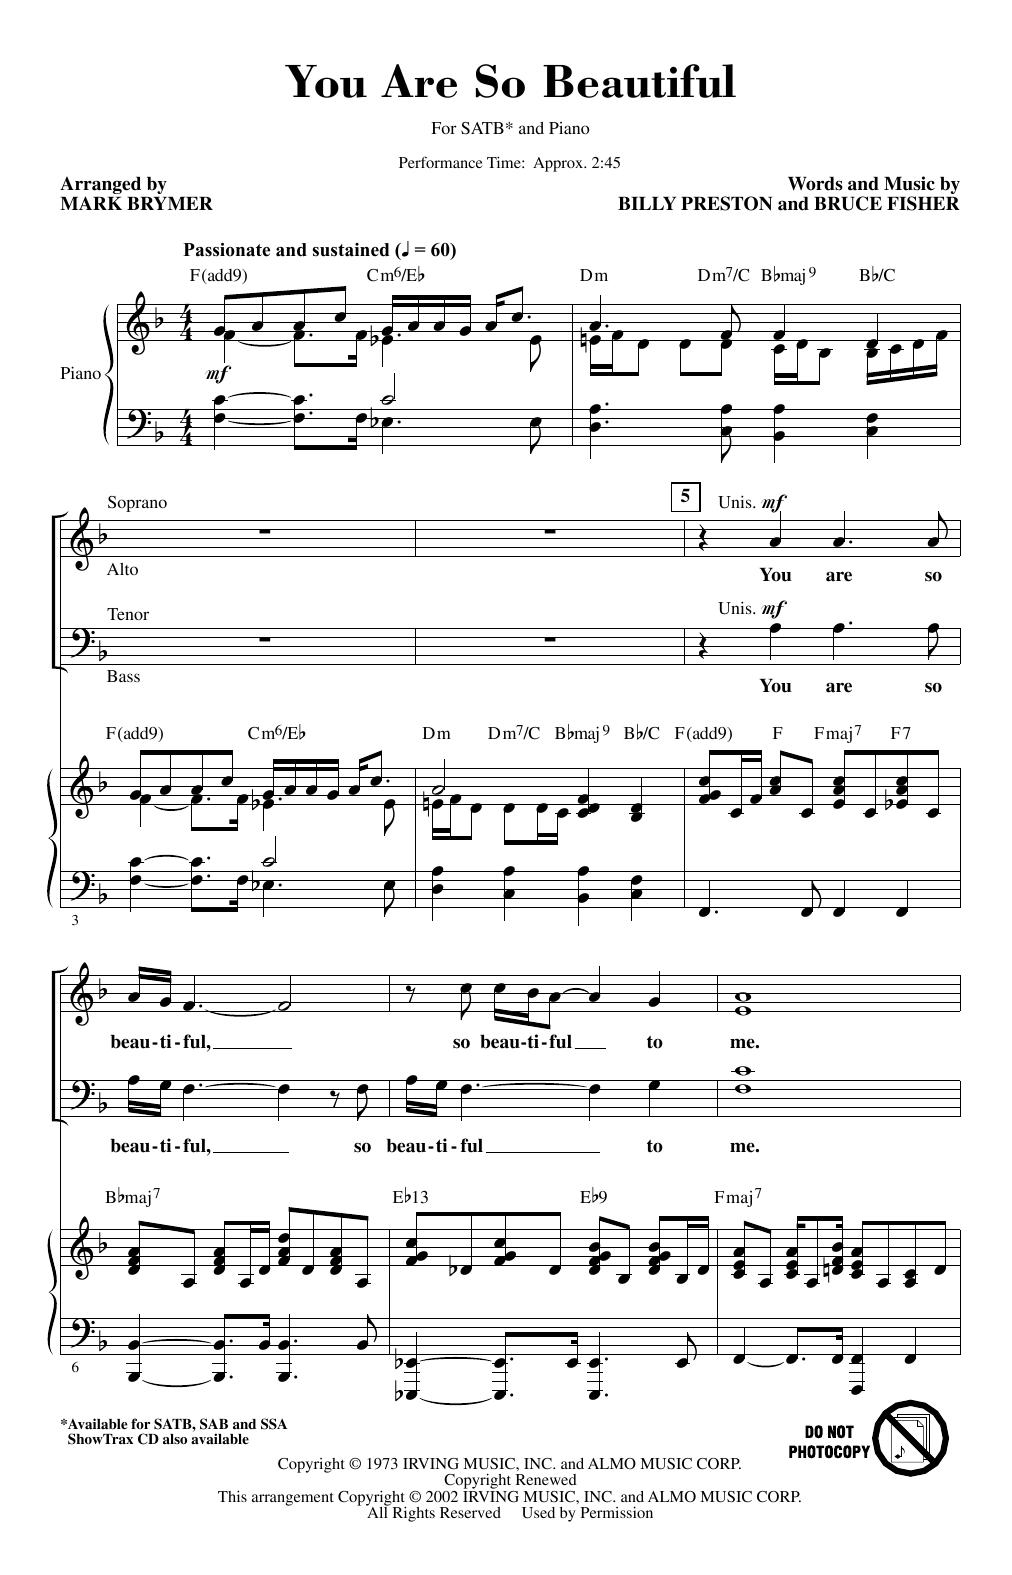 You Are So Beautiful (arr. Mark Brymer) (SATB Choir)